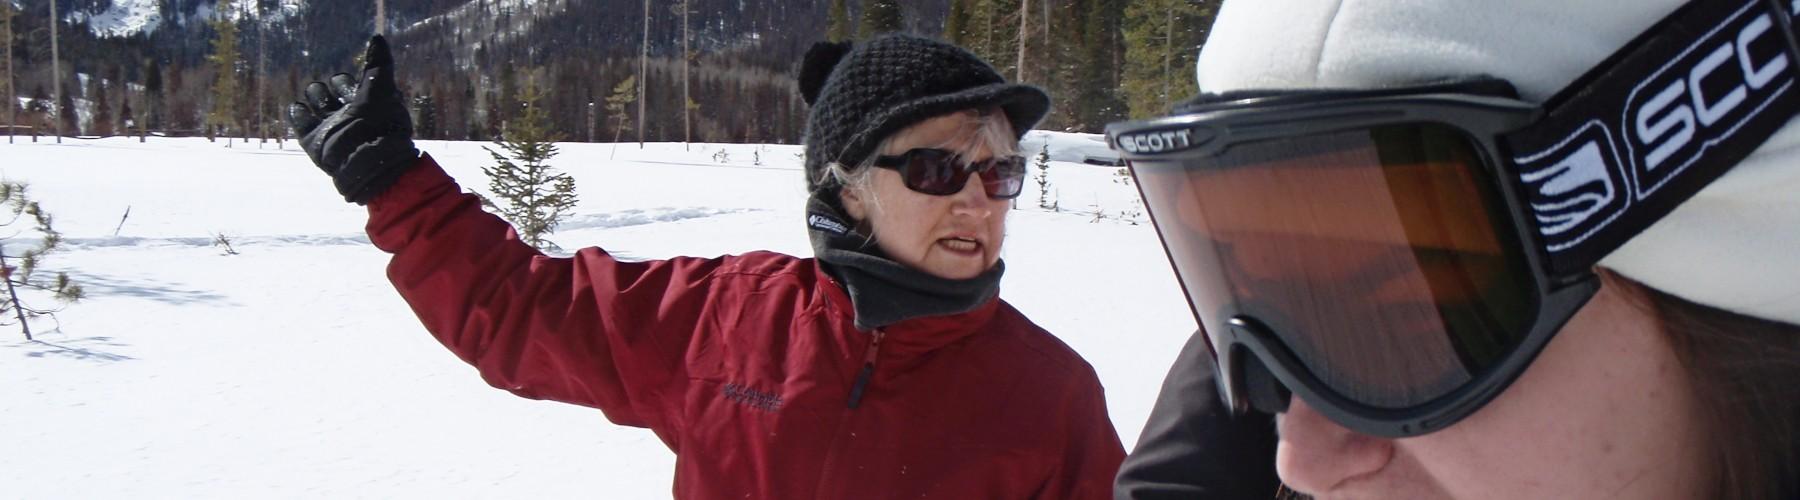 banner-skiing